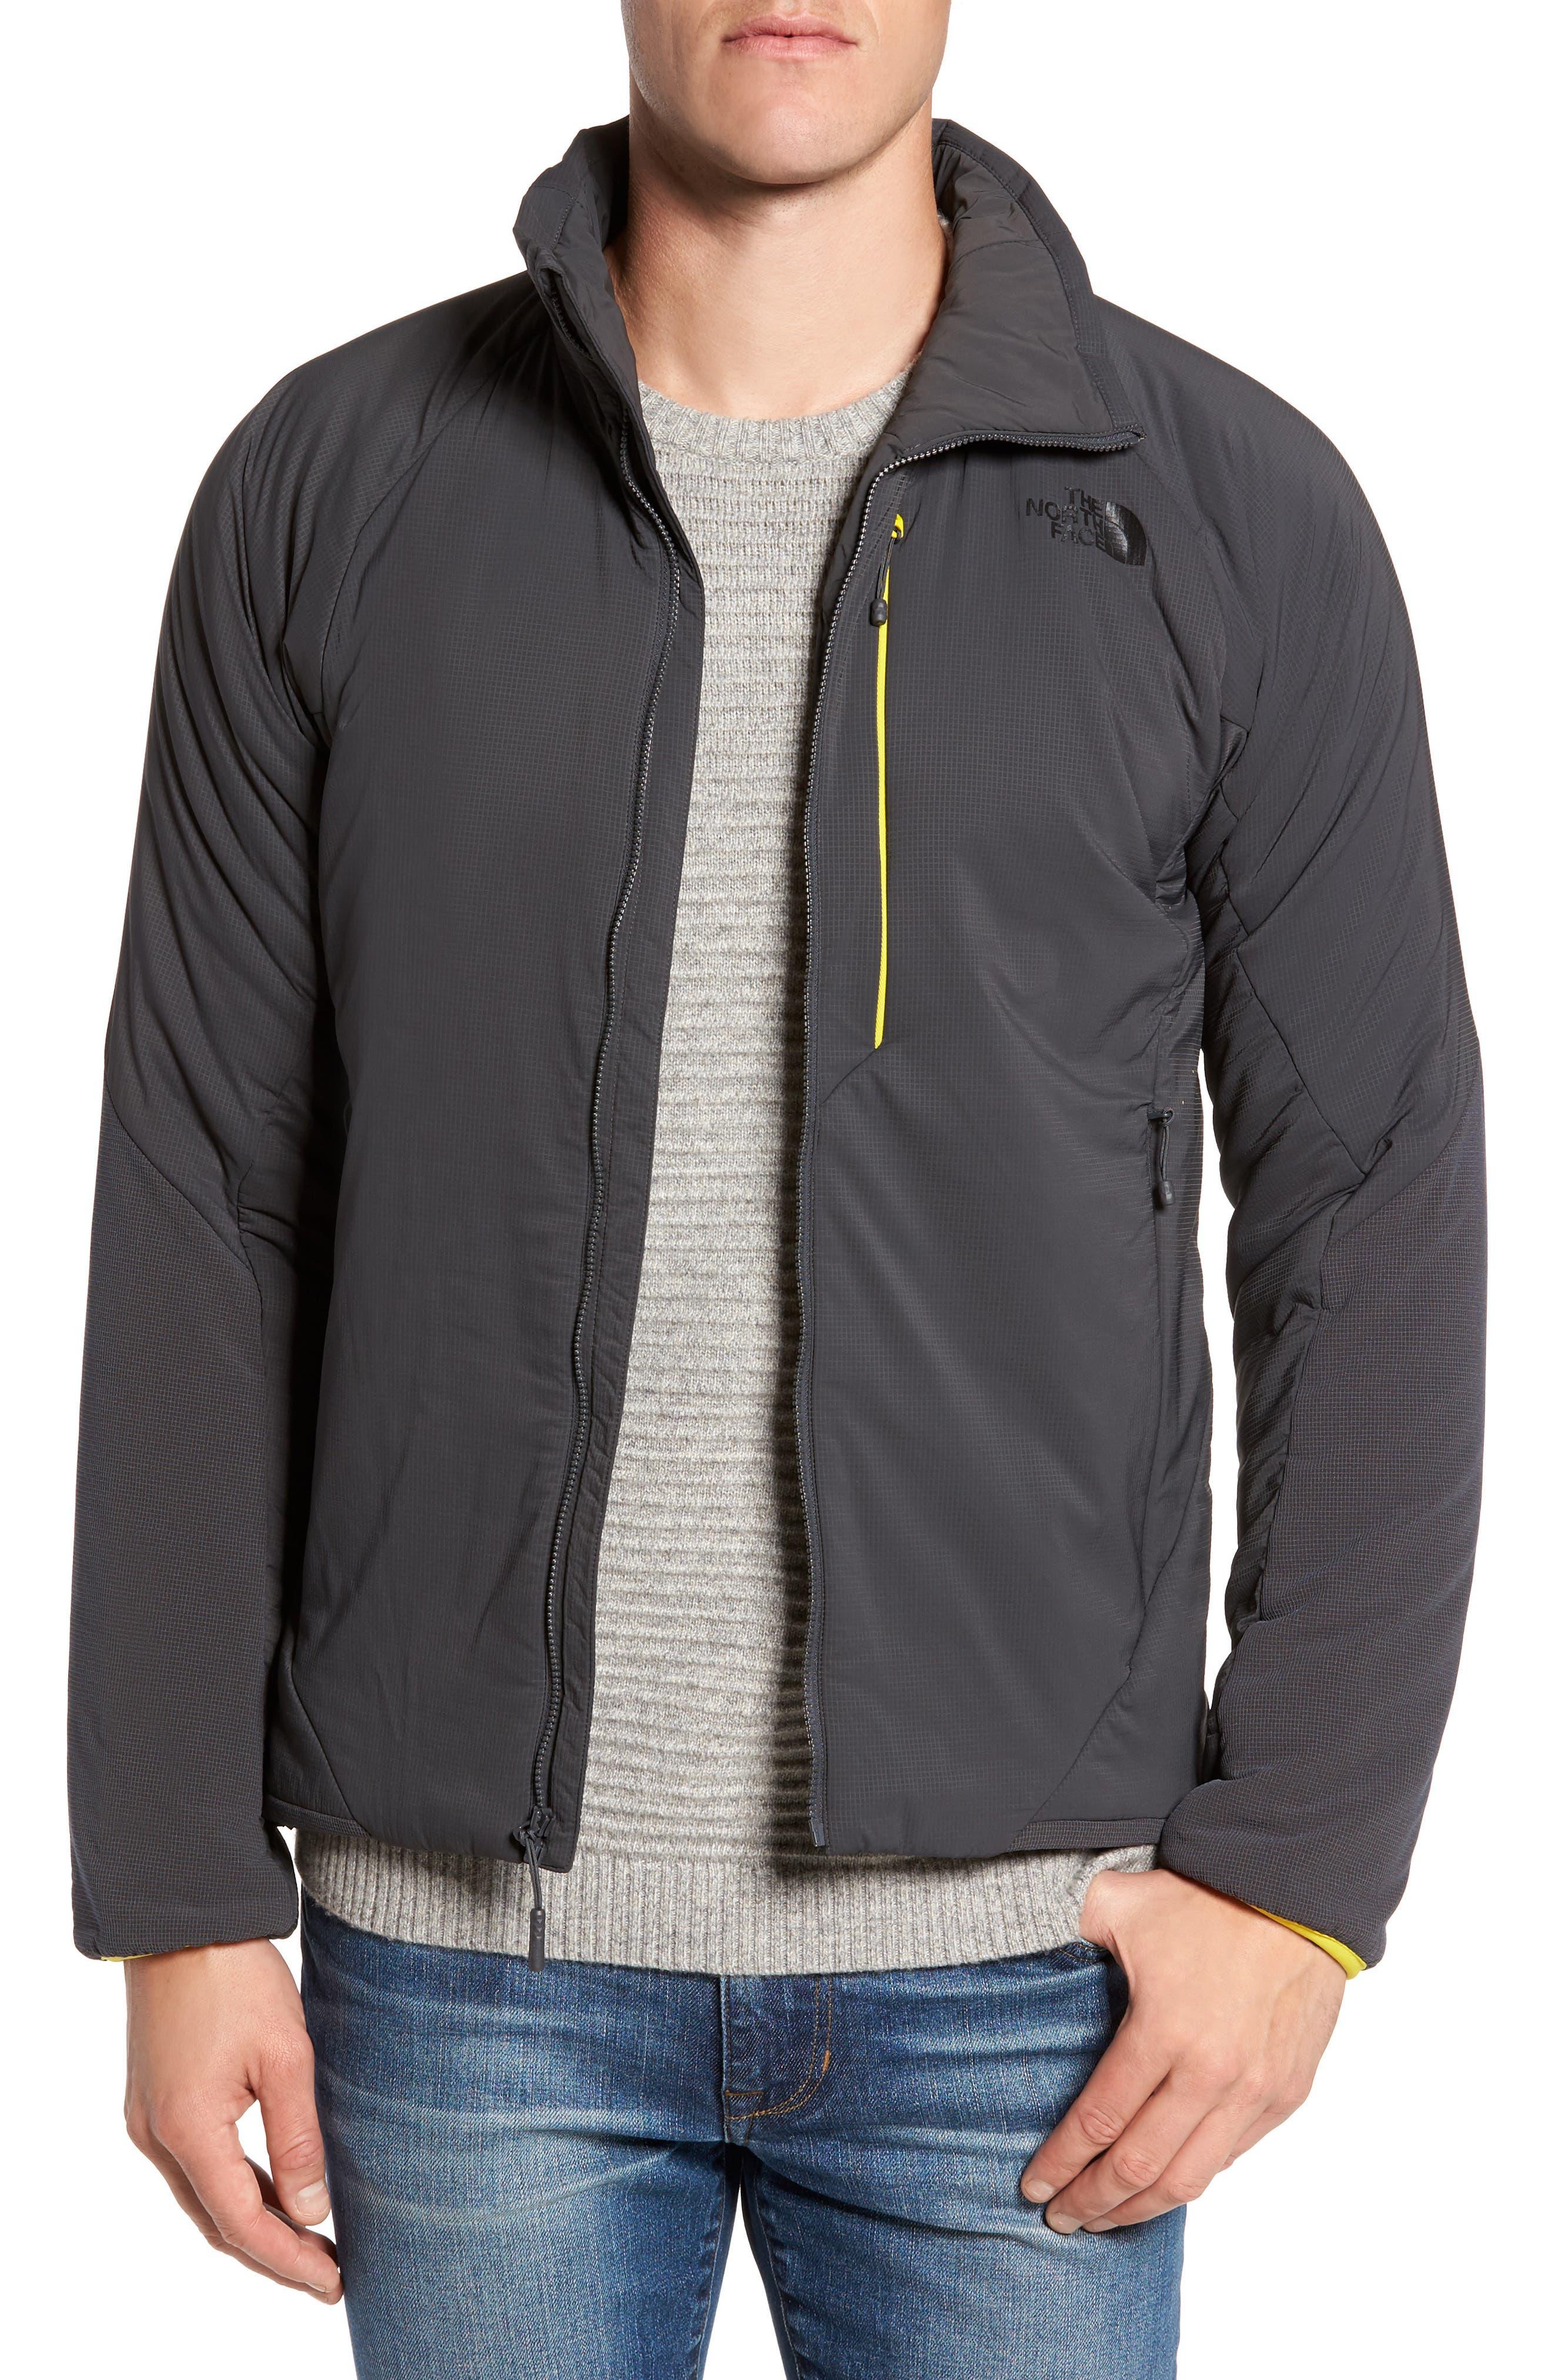 Ventrix Water Resistant Ripstop Jacket,                             Main thumbnail 1, color,                             ASPHALT GREY / ACID YELLOW